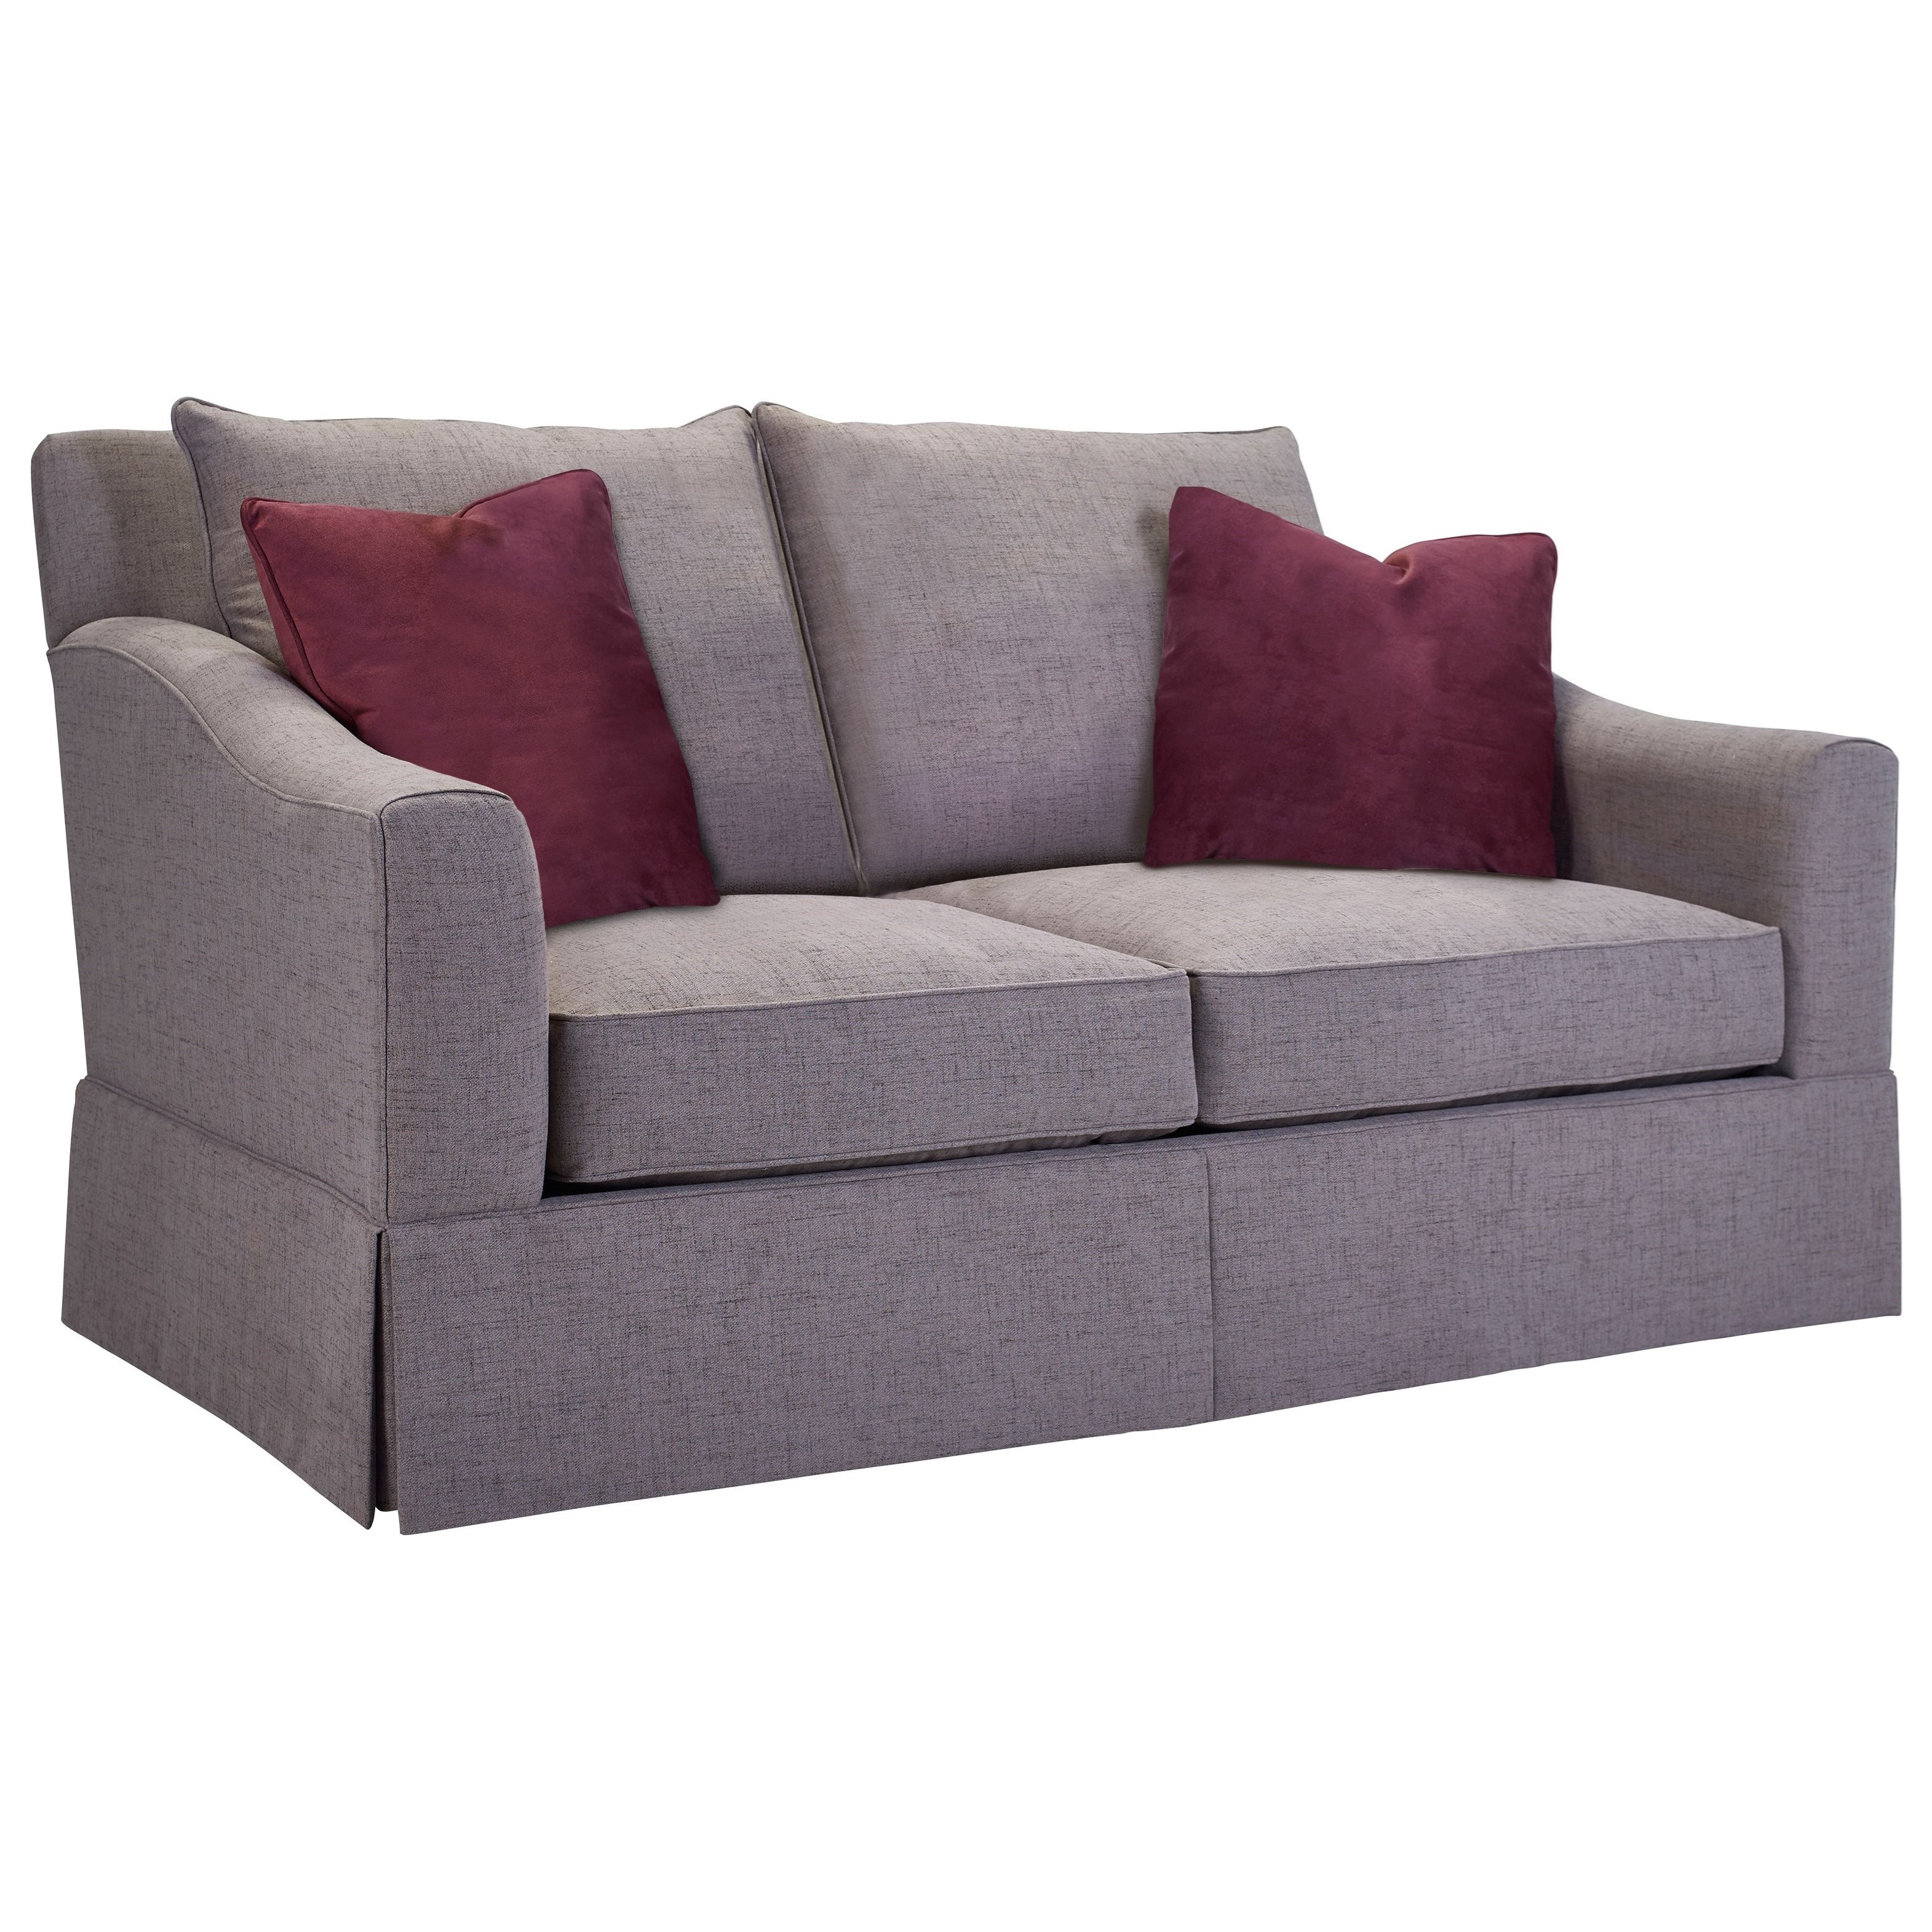 Best furniture design stores regina free hd wallpapers for Best furniture design